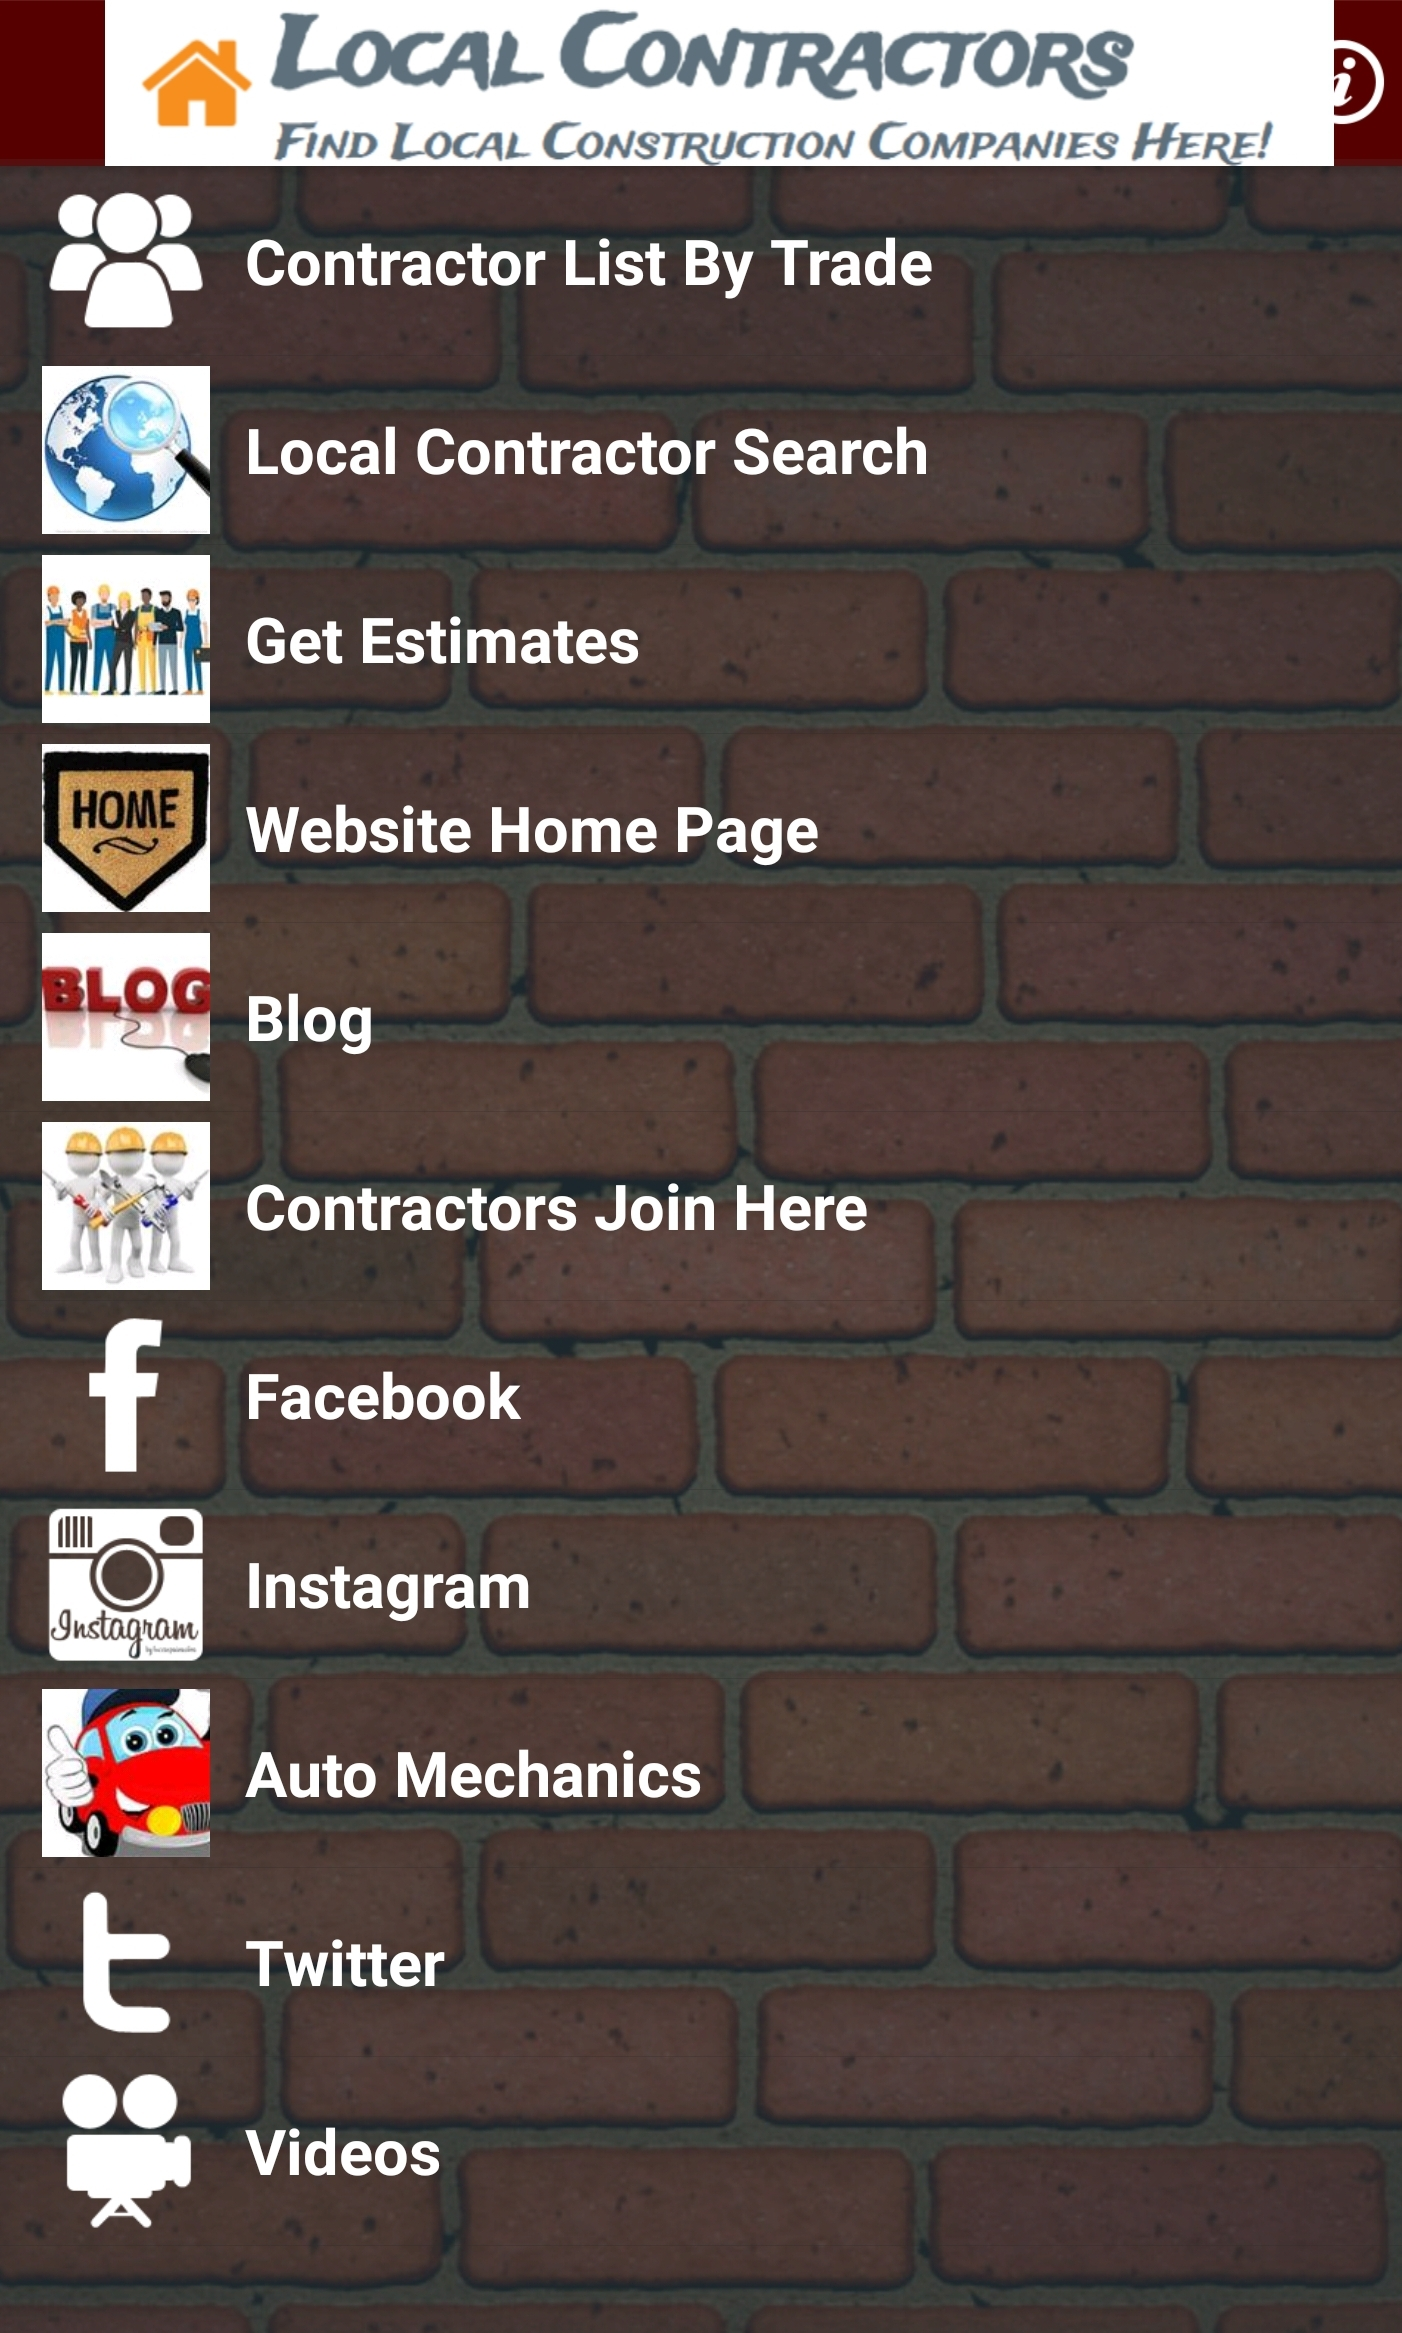 Local Contractors App